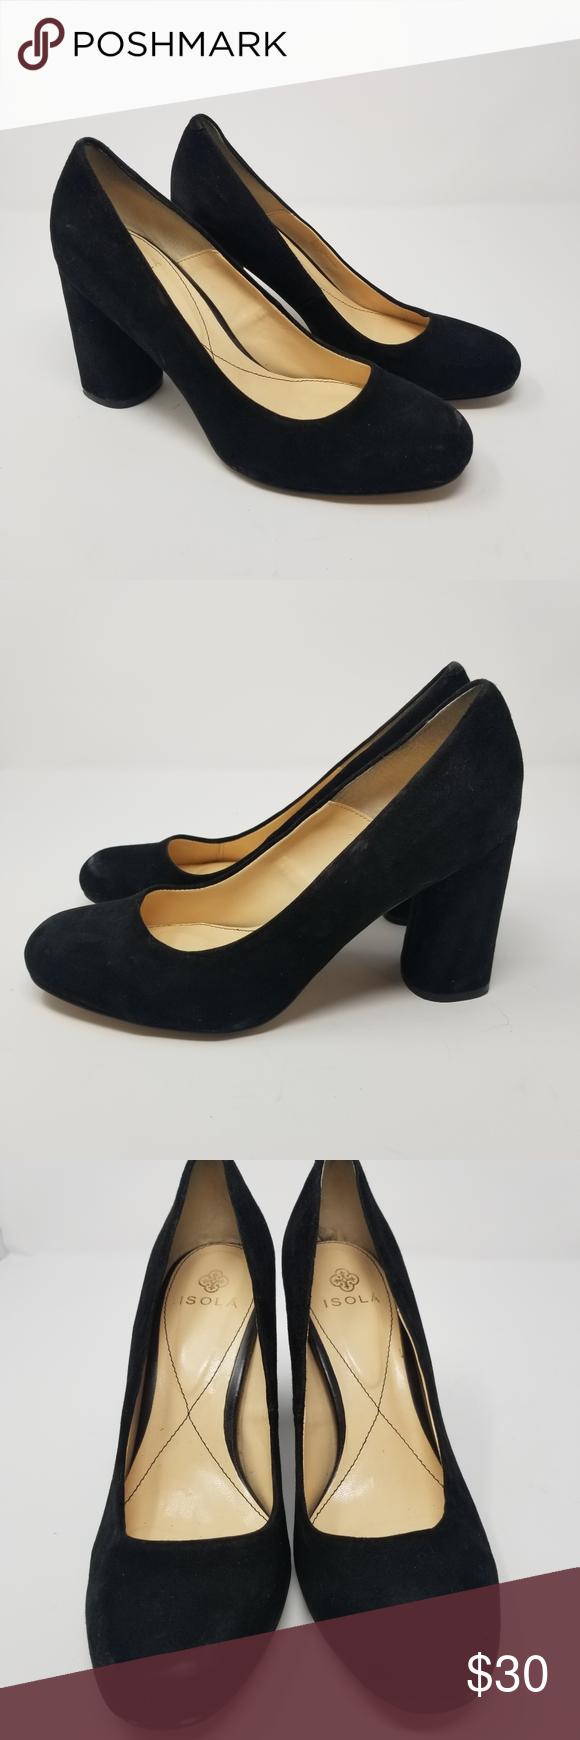 Isola Elaine Black Suede Round Toe Block Heels In 2020 Heels Shoes Women Heels Black Suede